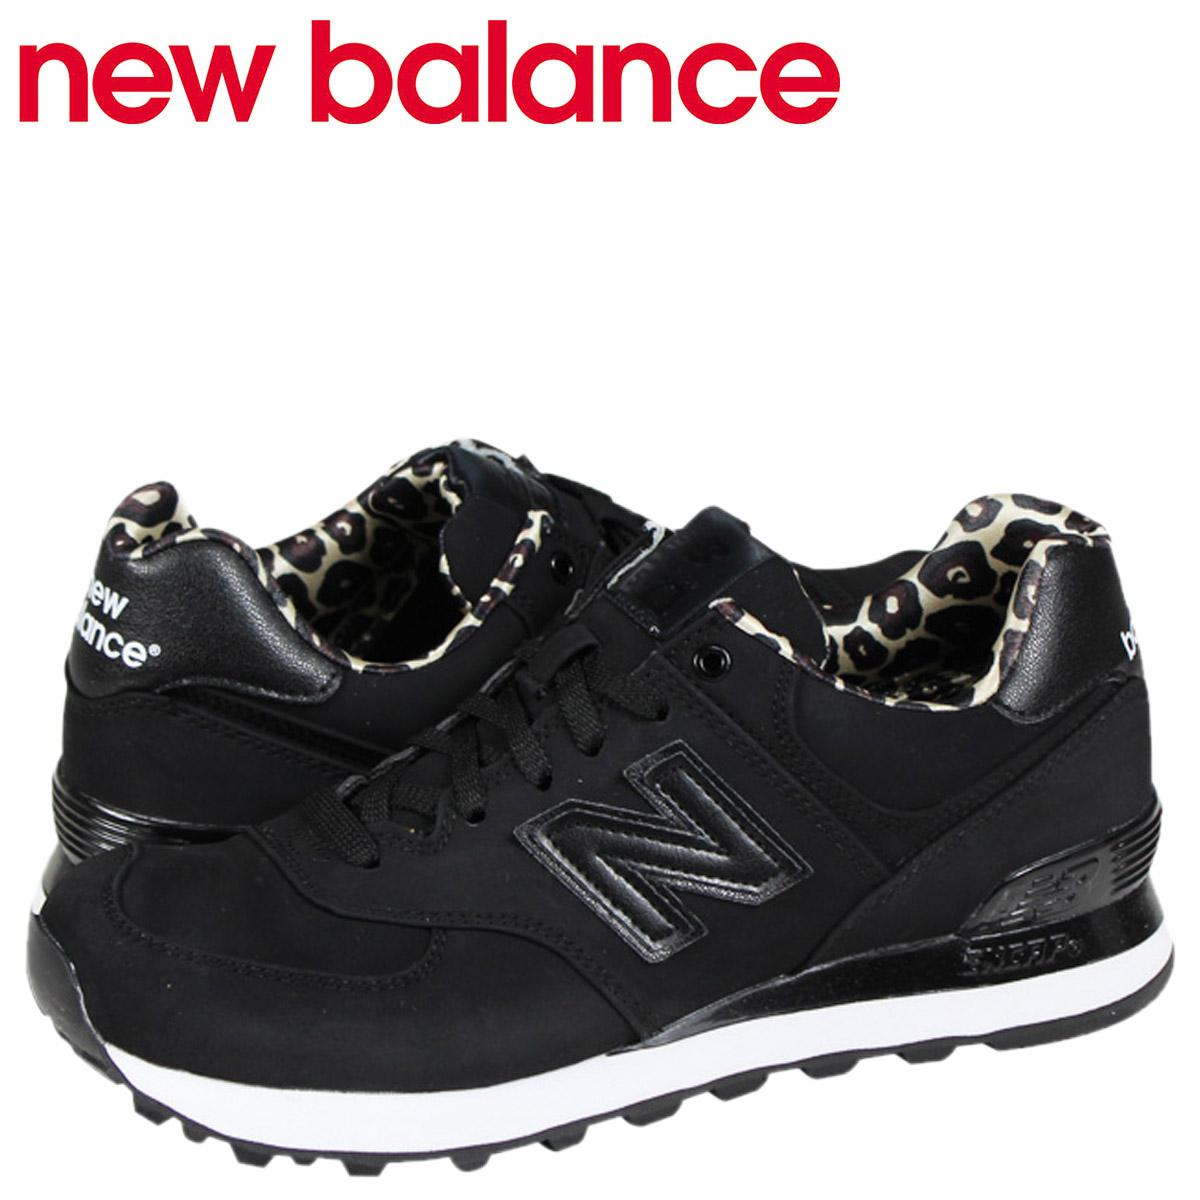 new balance womens shoes 574 high roller